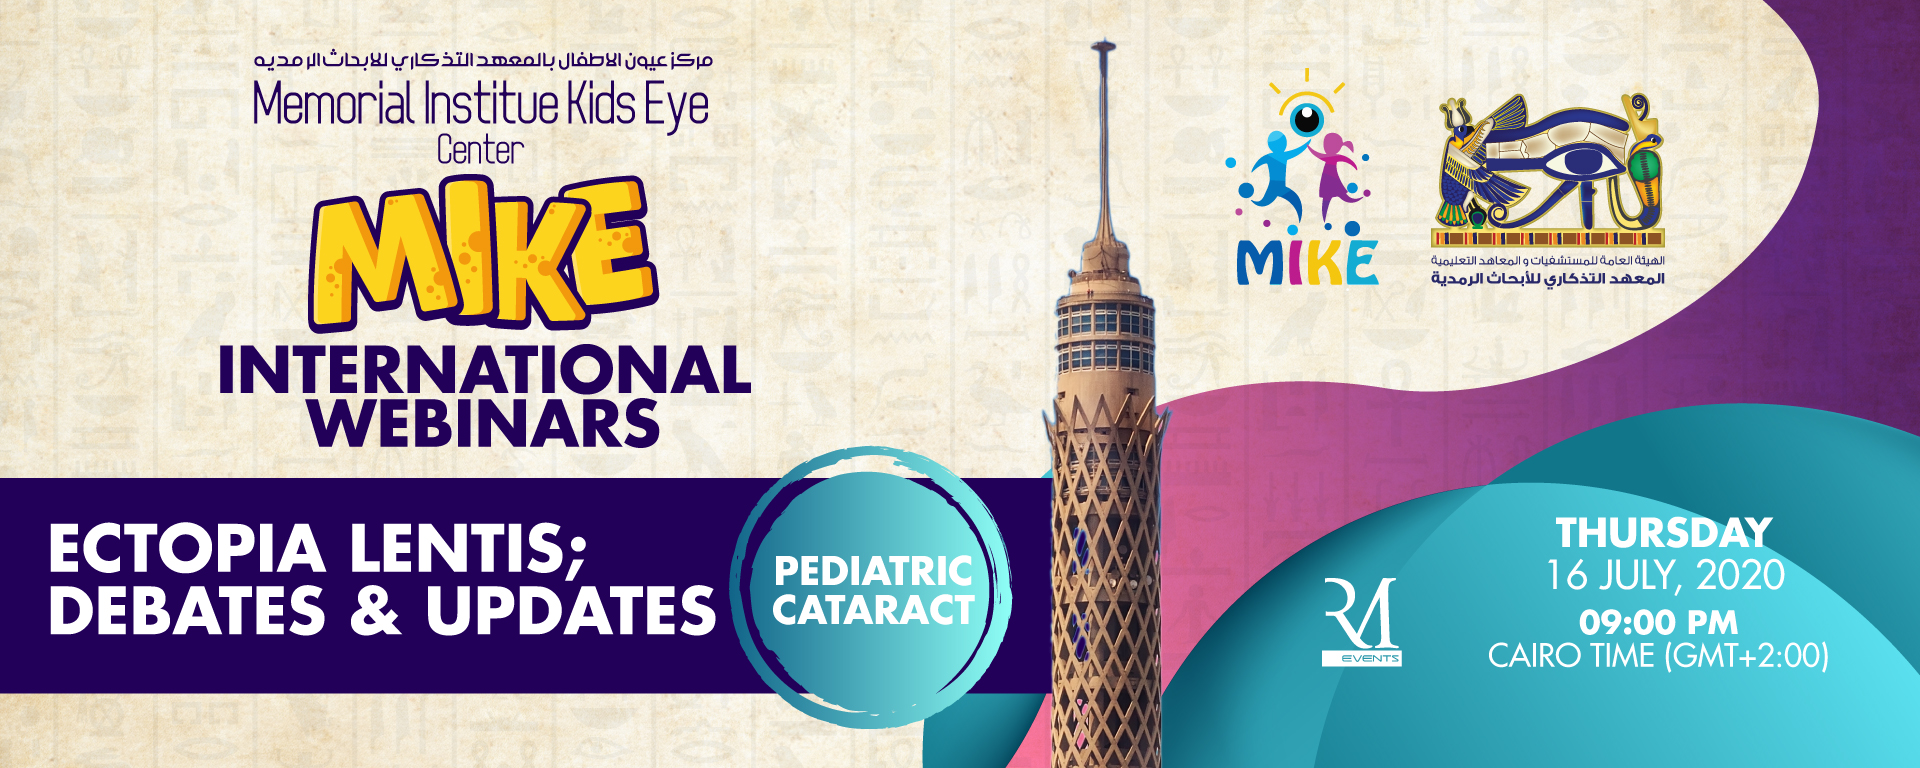 MIKE International Webinars